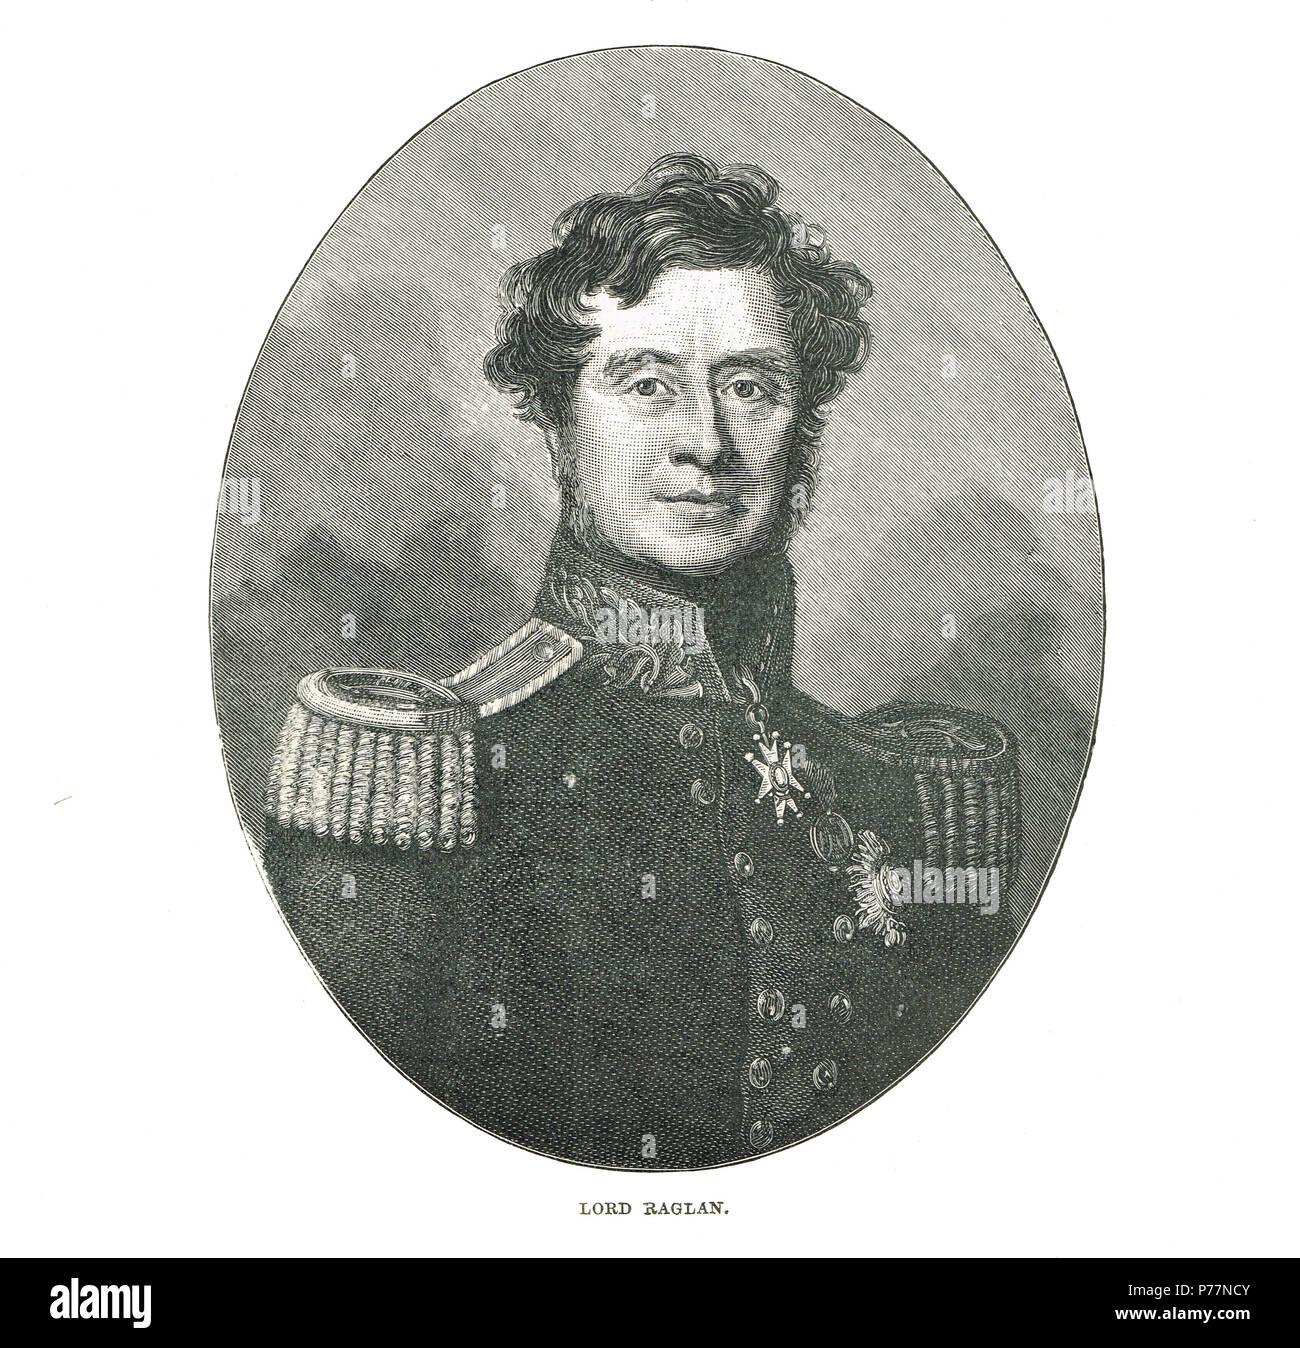 Field Marshal FitzRoy Somerset, 1st Baron Raglan - Stock Image